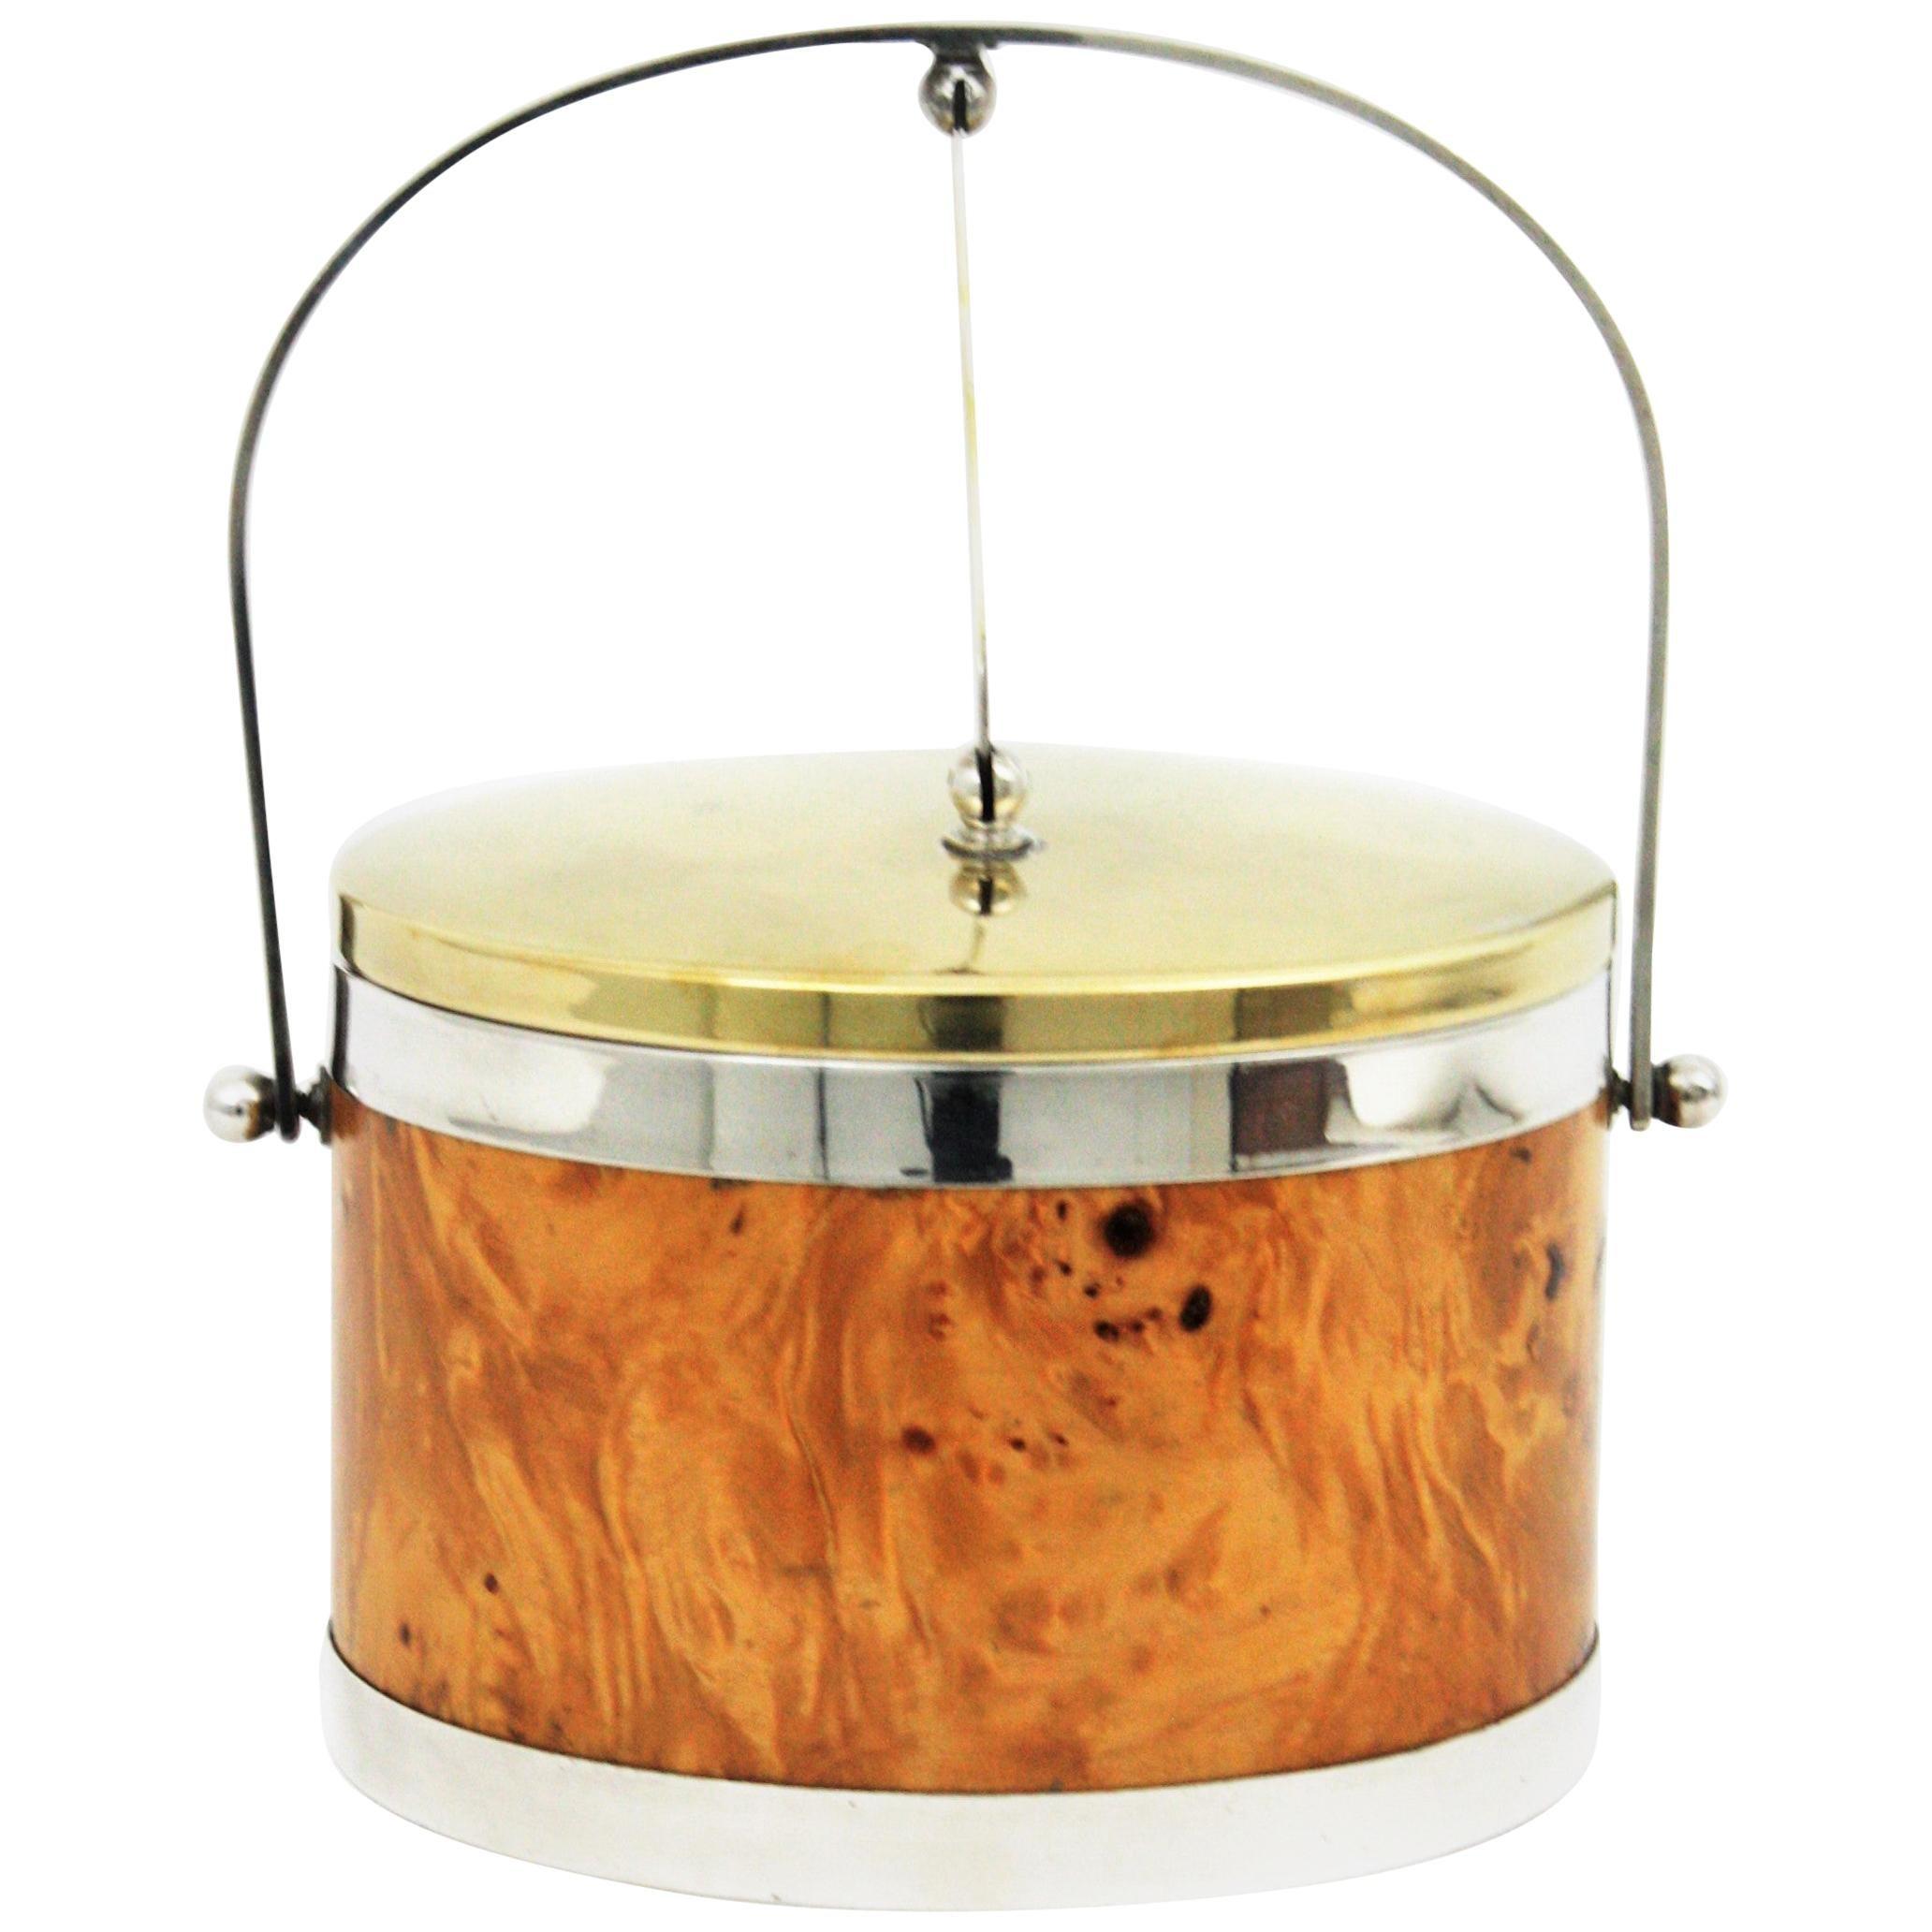 Burl Wood, Brass and Chrome Italian Ice Bucket, 1960s